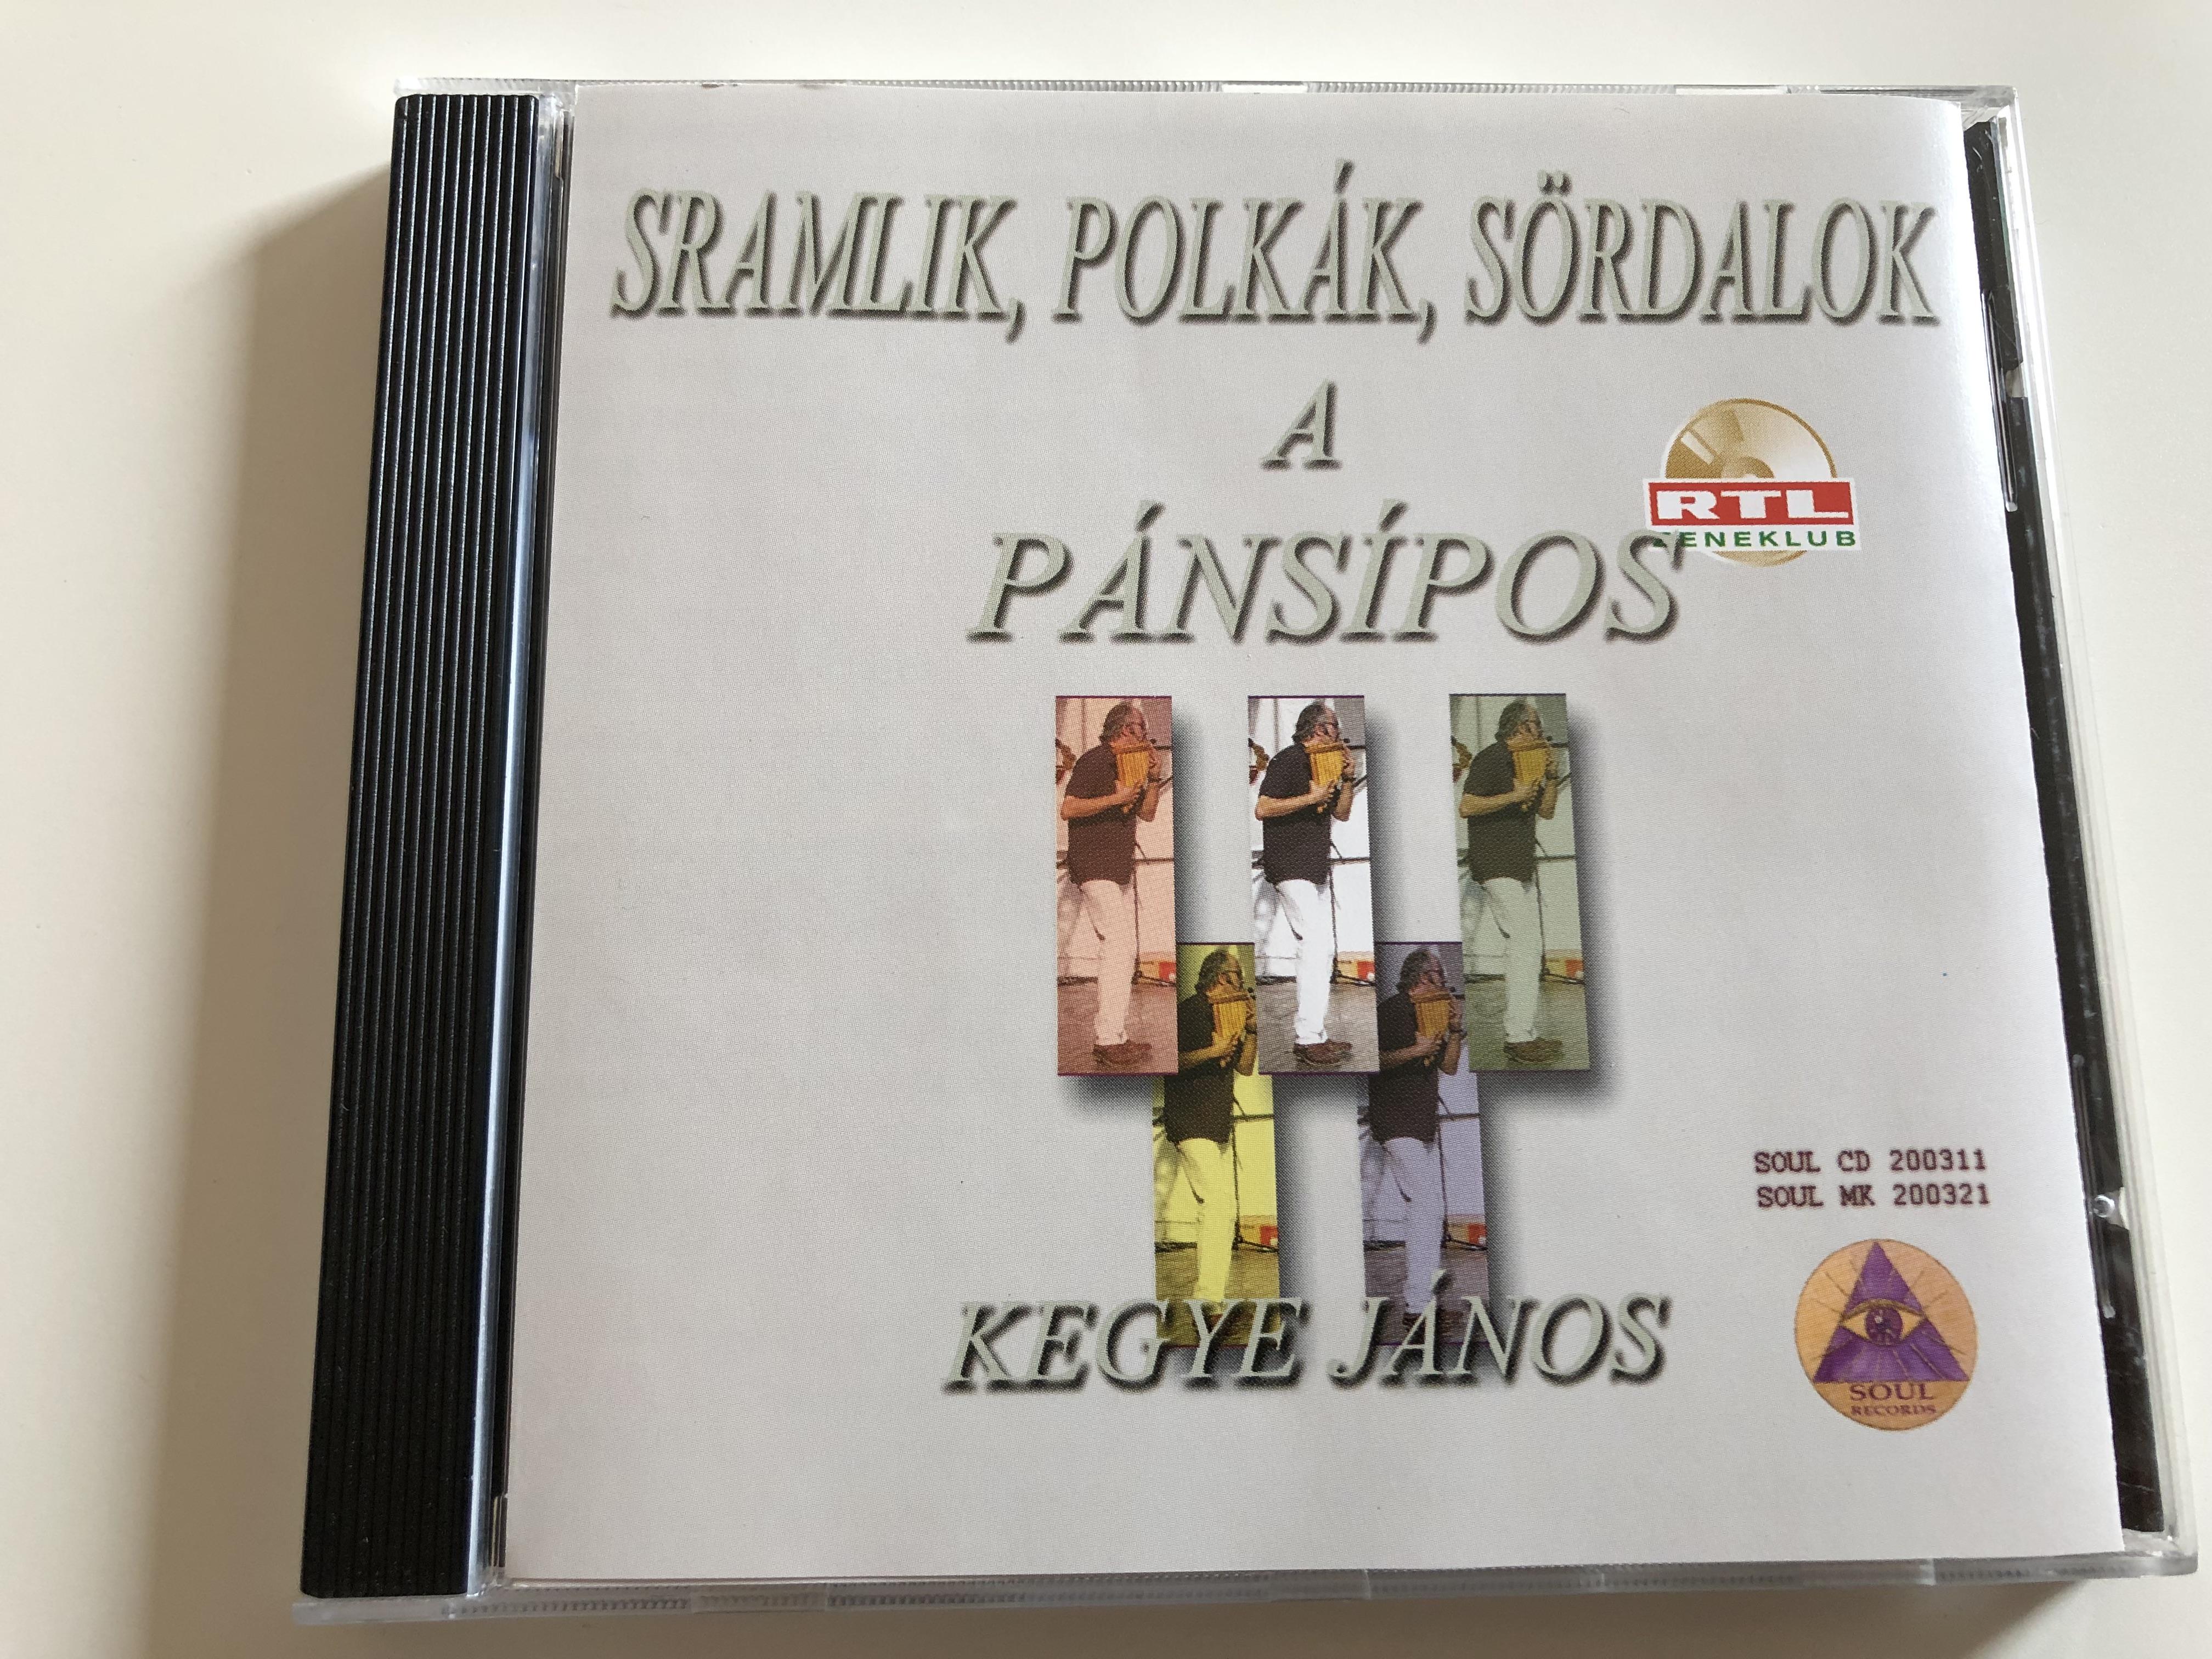 sramlik-polka-k-so-rdalok-a-pa-nsi-pos-kegye-ja-nosimg-2210.jpg